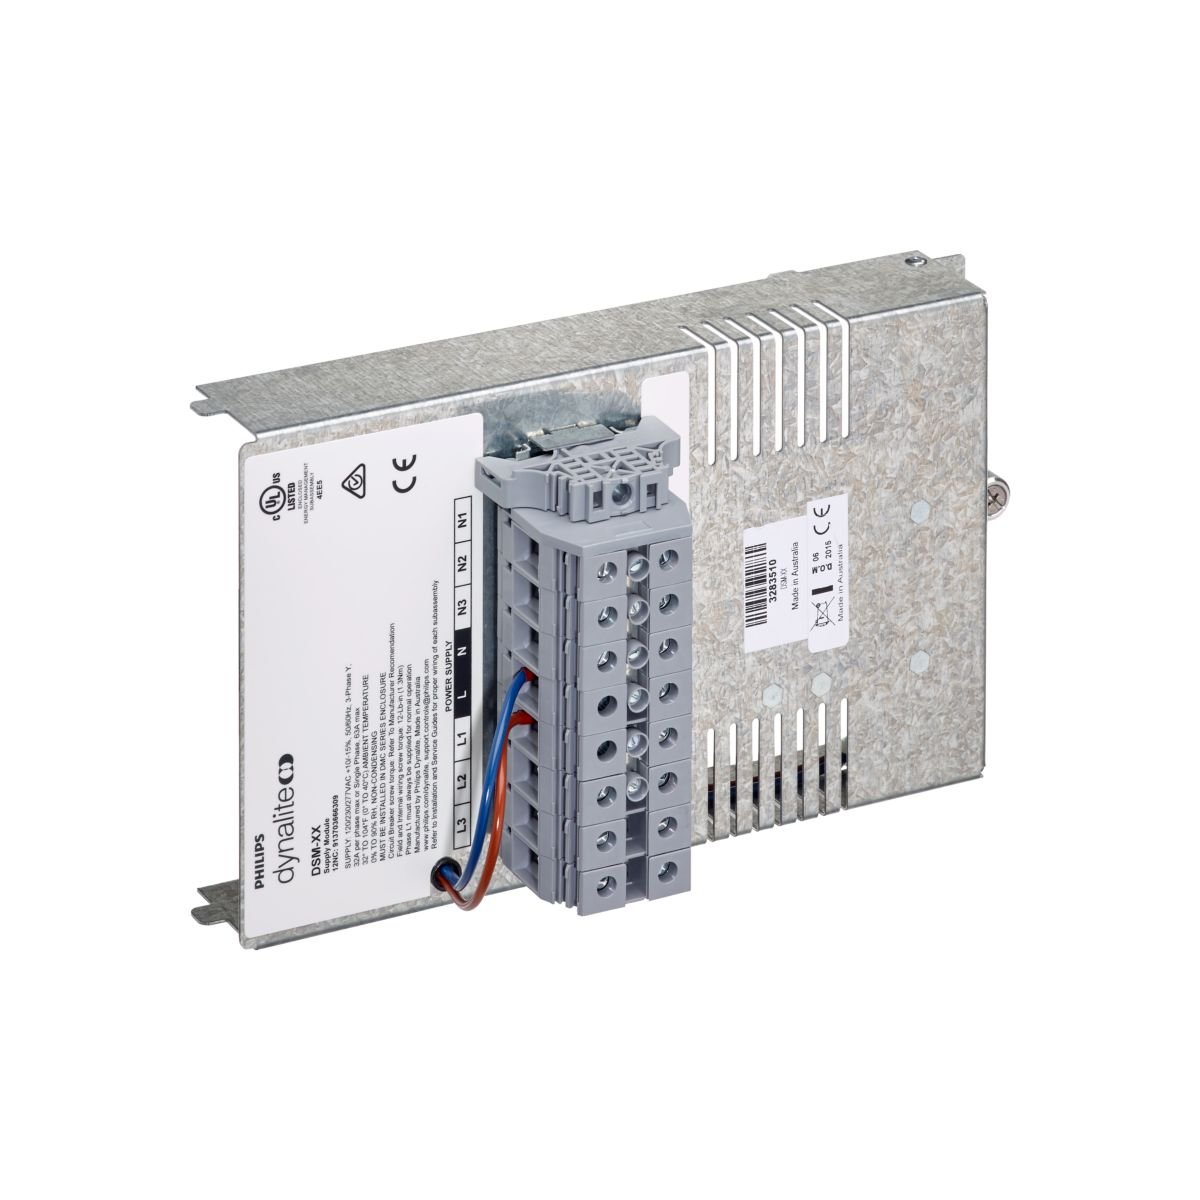 Dynalite Multipurpose Controllers Philips Lighting Best Circuit Breaker Finder